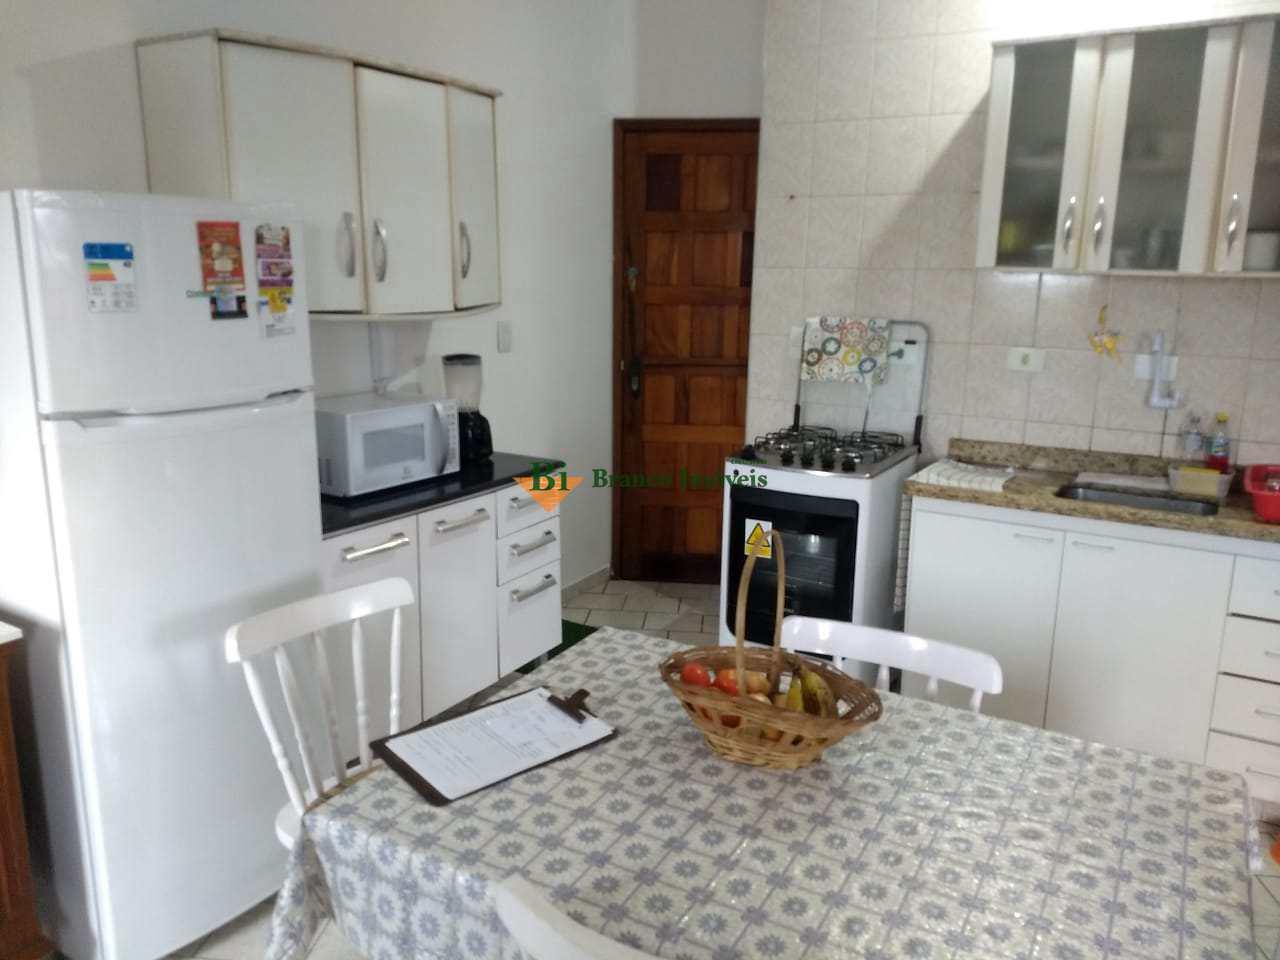 Kitnet, Caiçara, Praia Grande - R$ 100 mil, Cod: 783